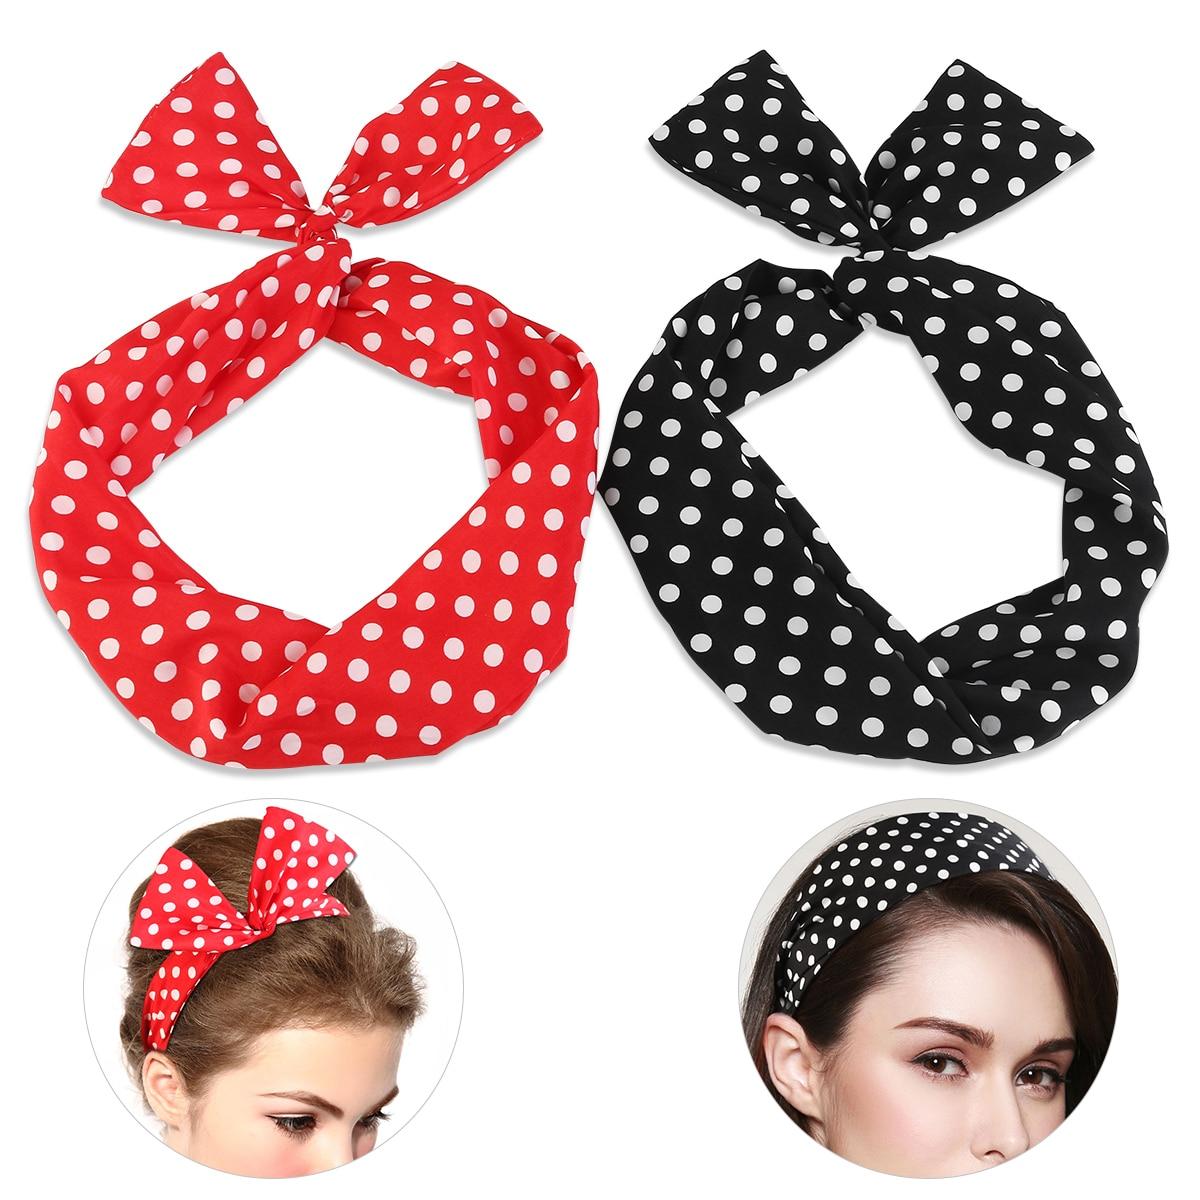 PIXNOR 2pcs Women Chiffon Head Wrap Cross Elastic Stretch Dot Hairband